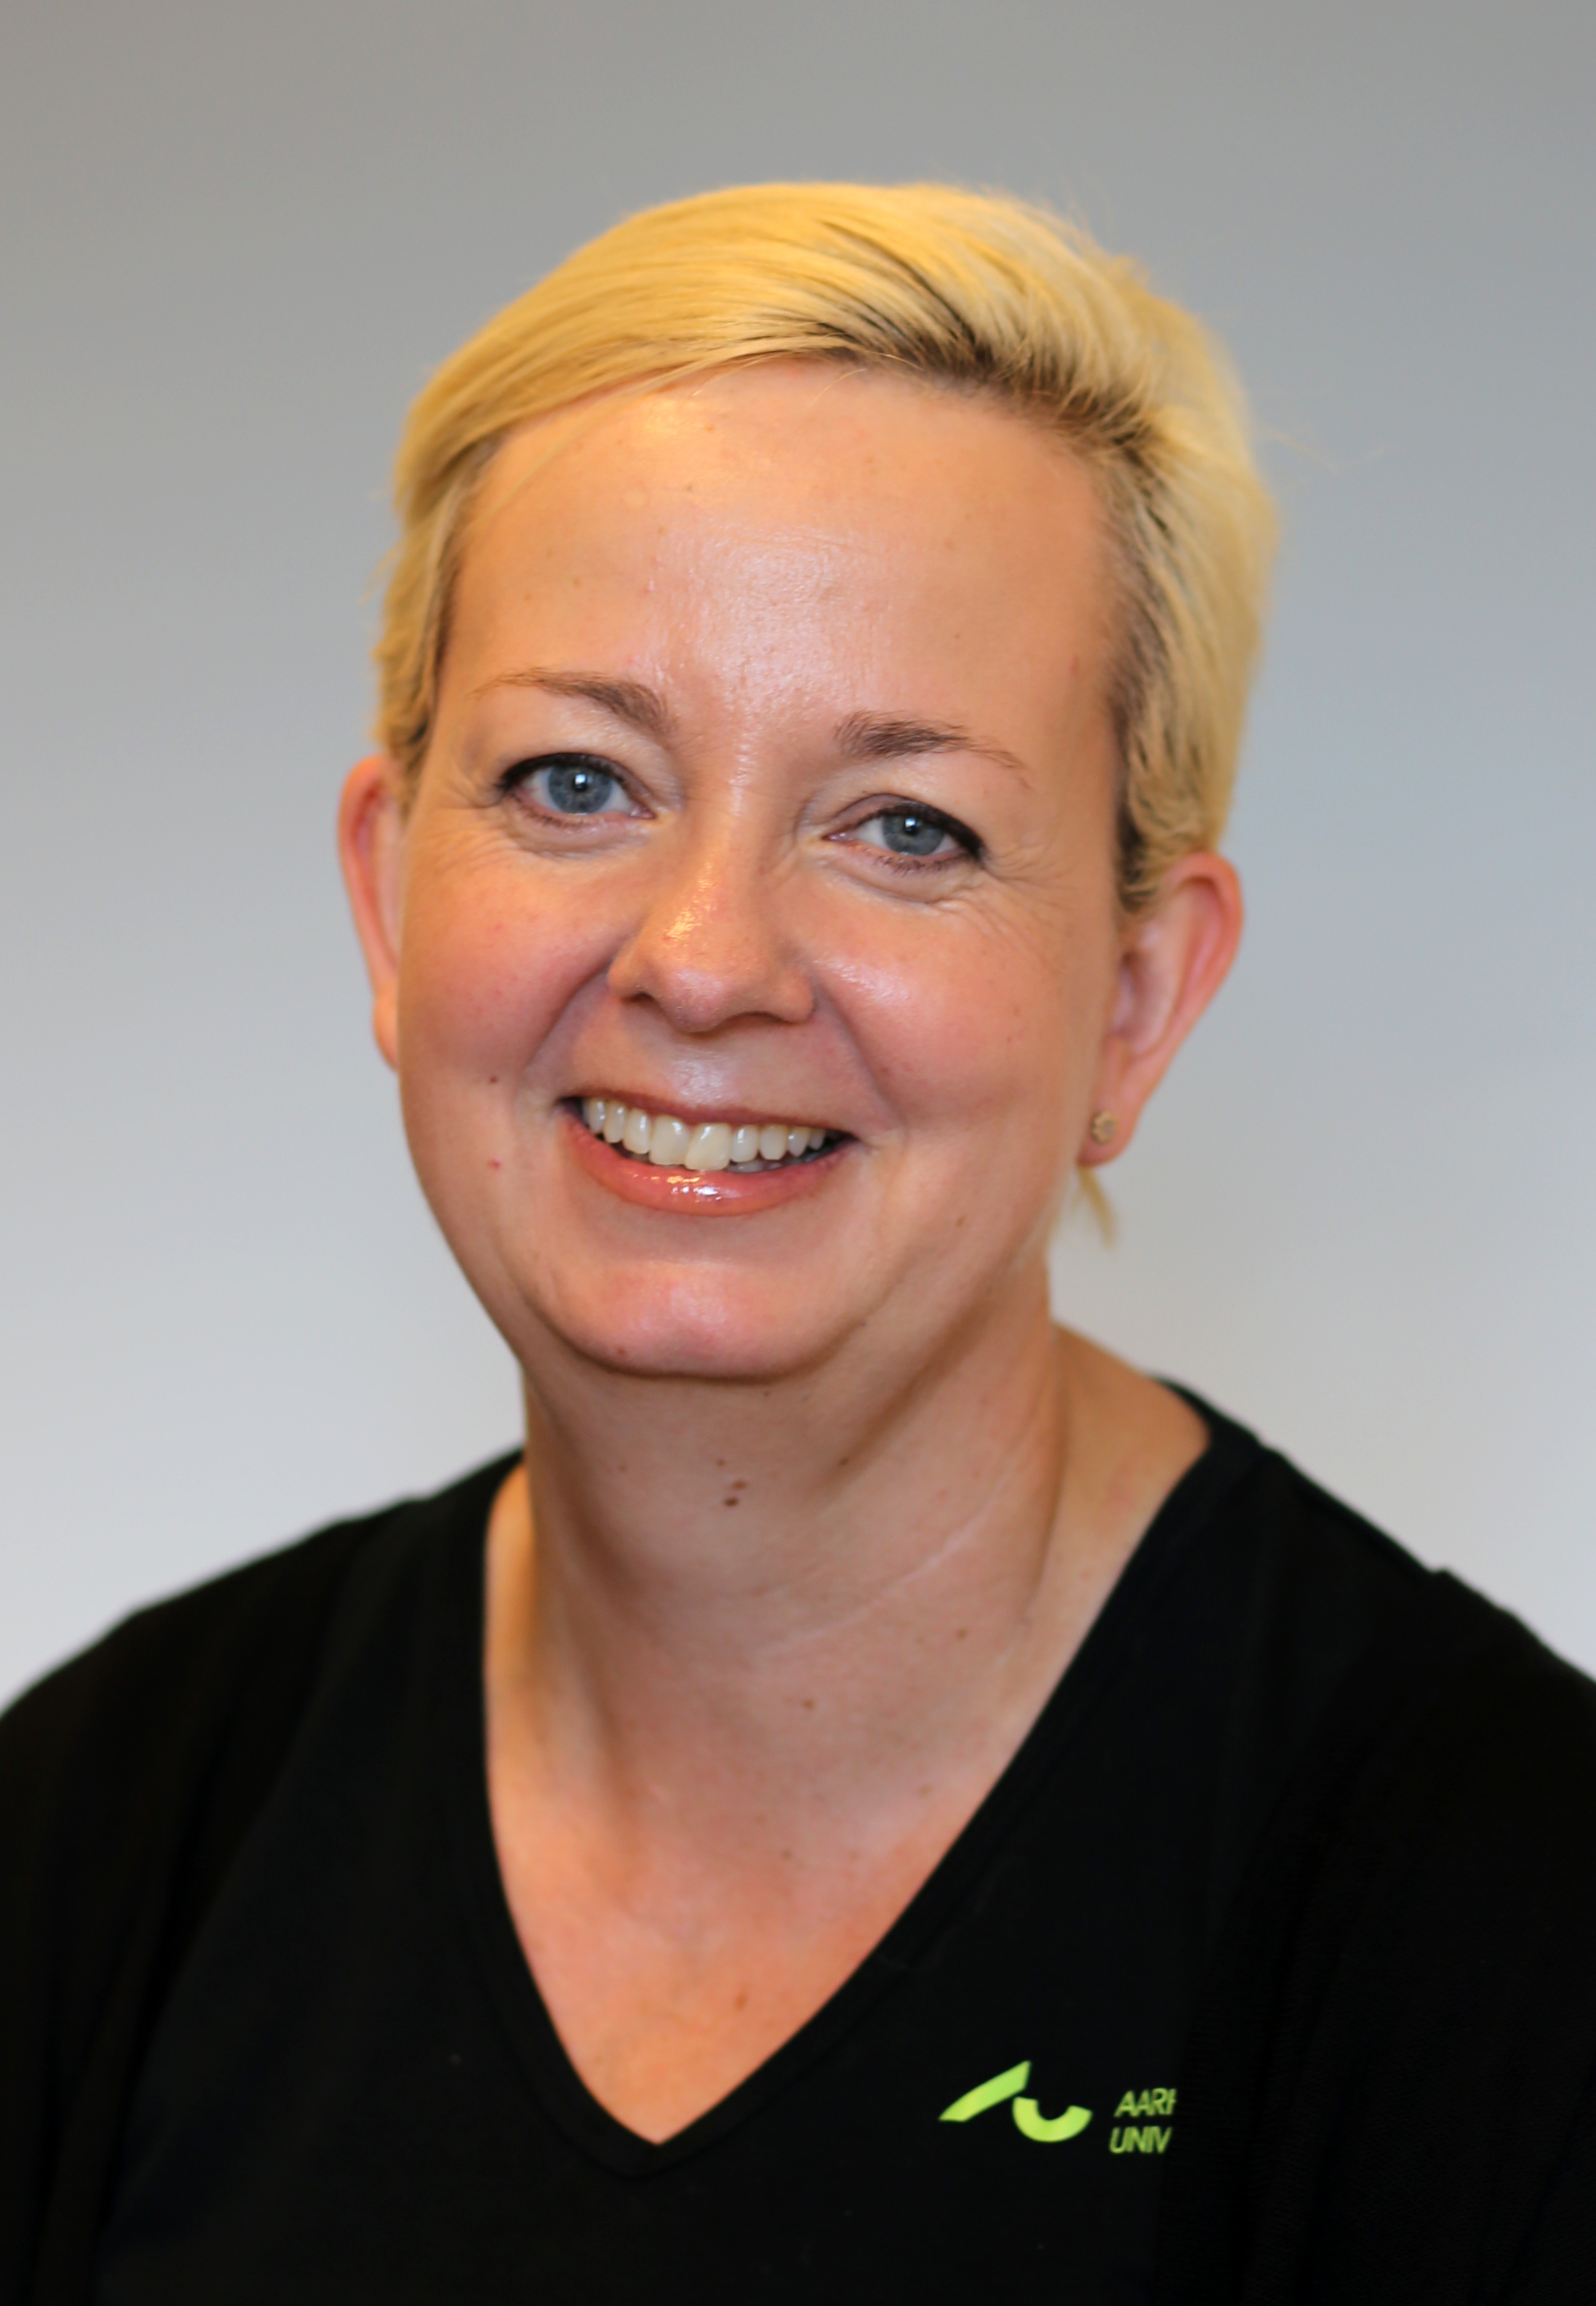 Birgitte Mortensen